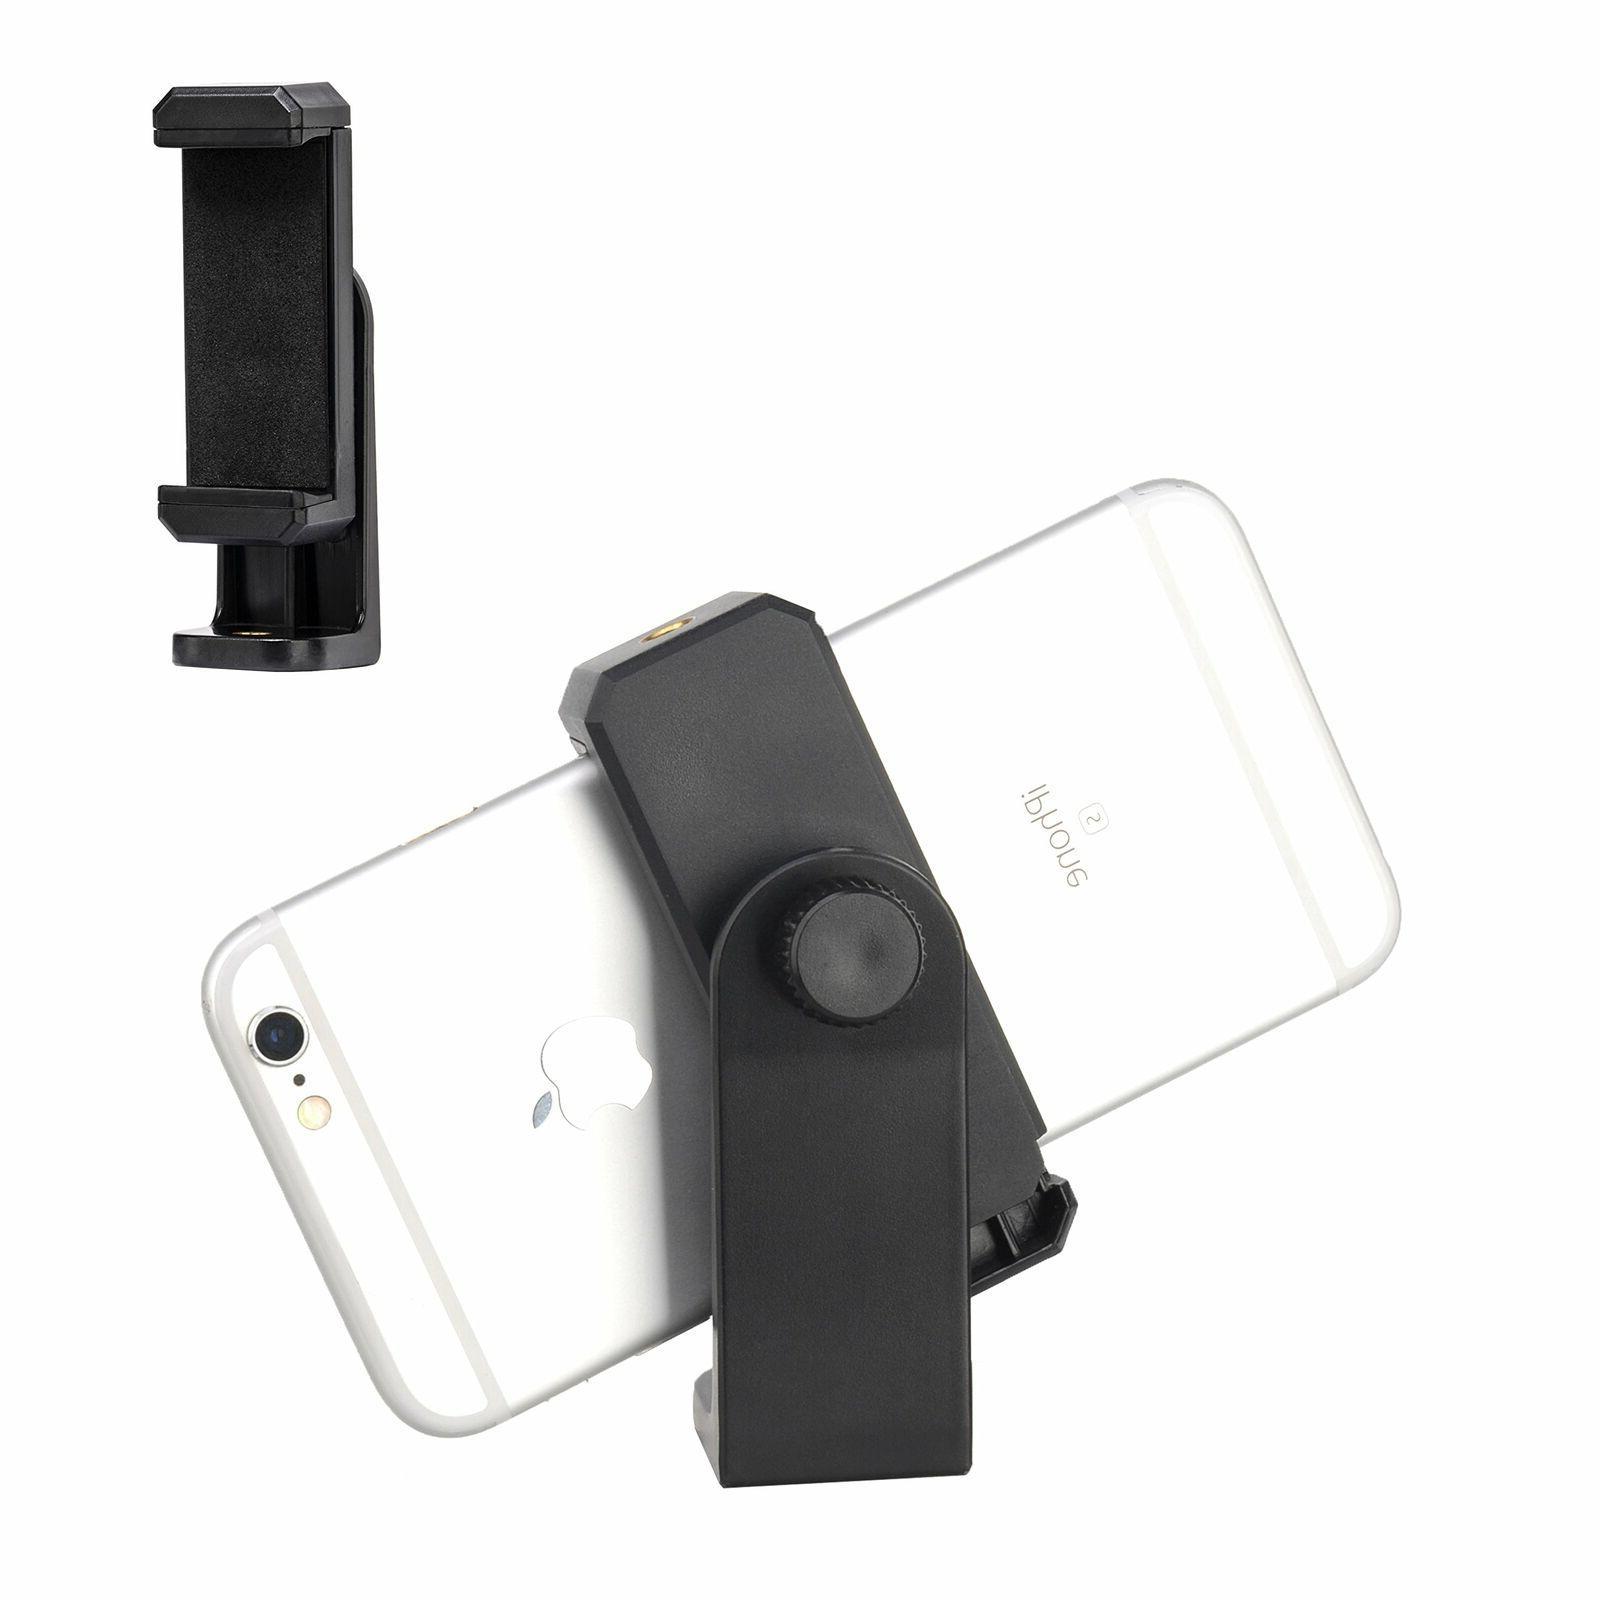 Smartphone Tripod Phone Camera For Filming Video